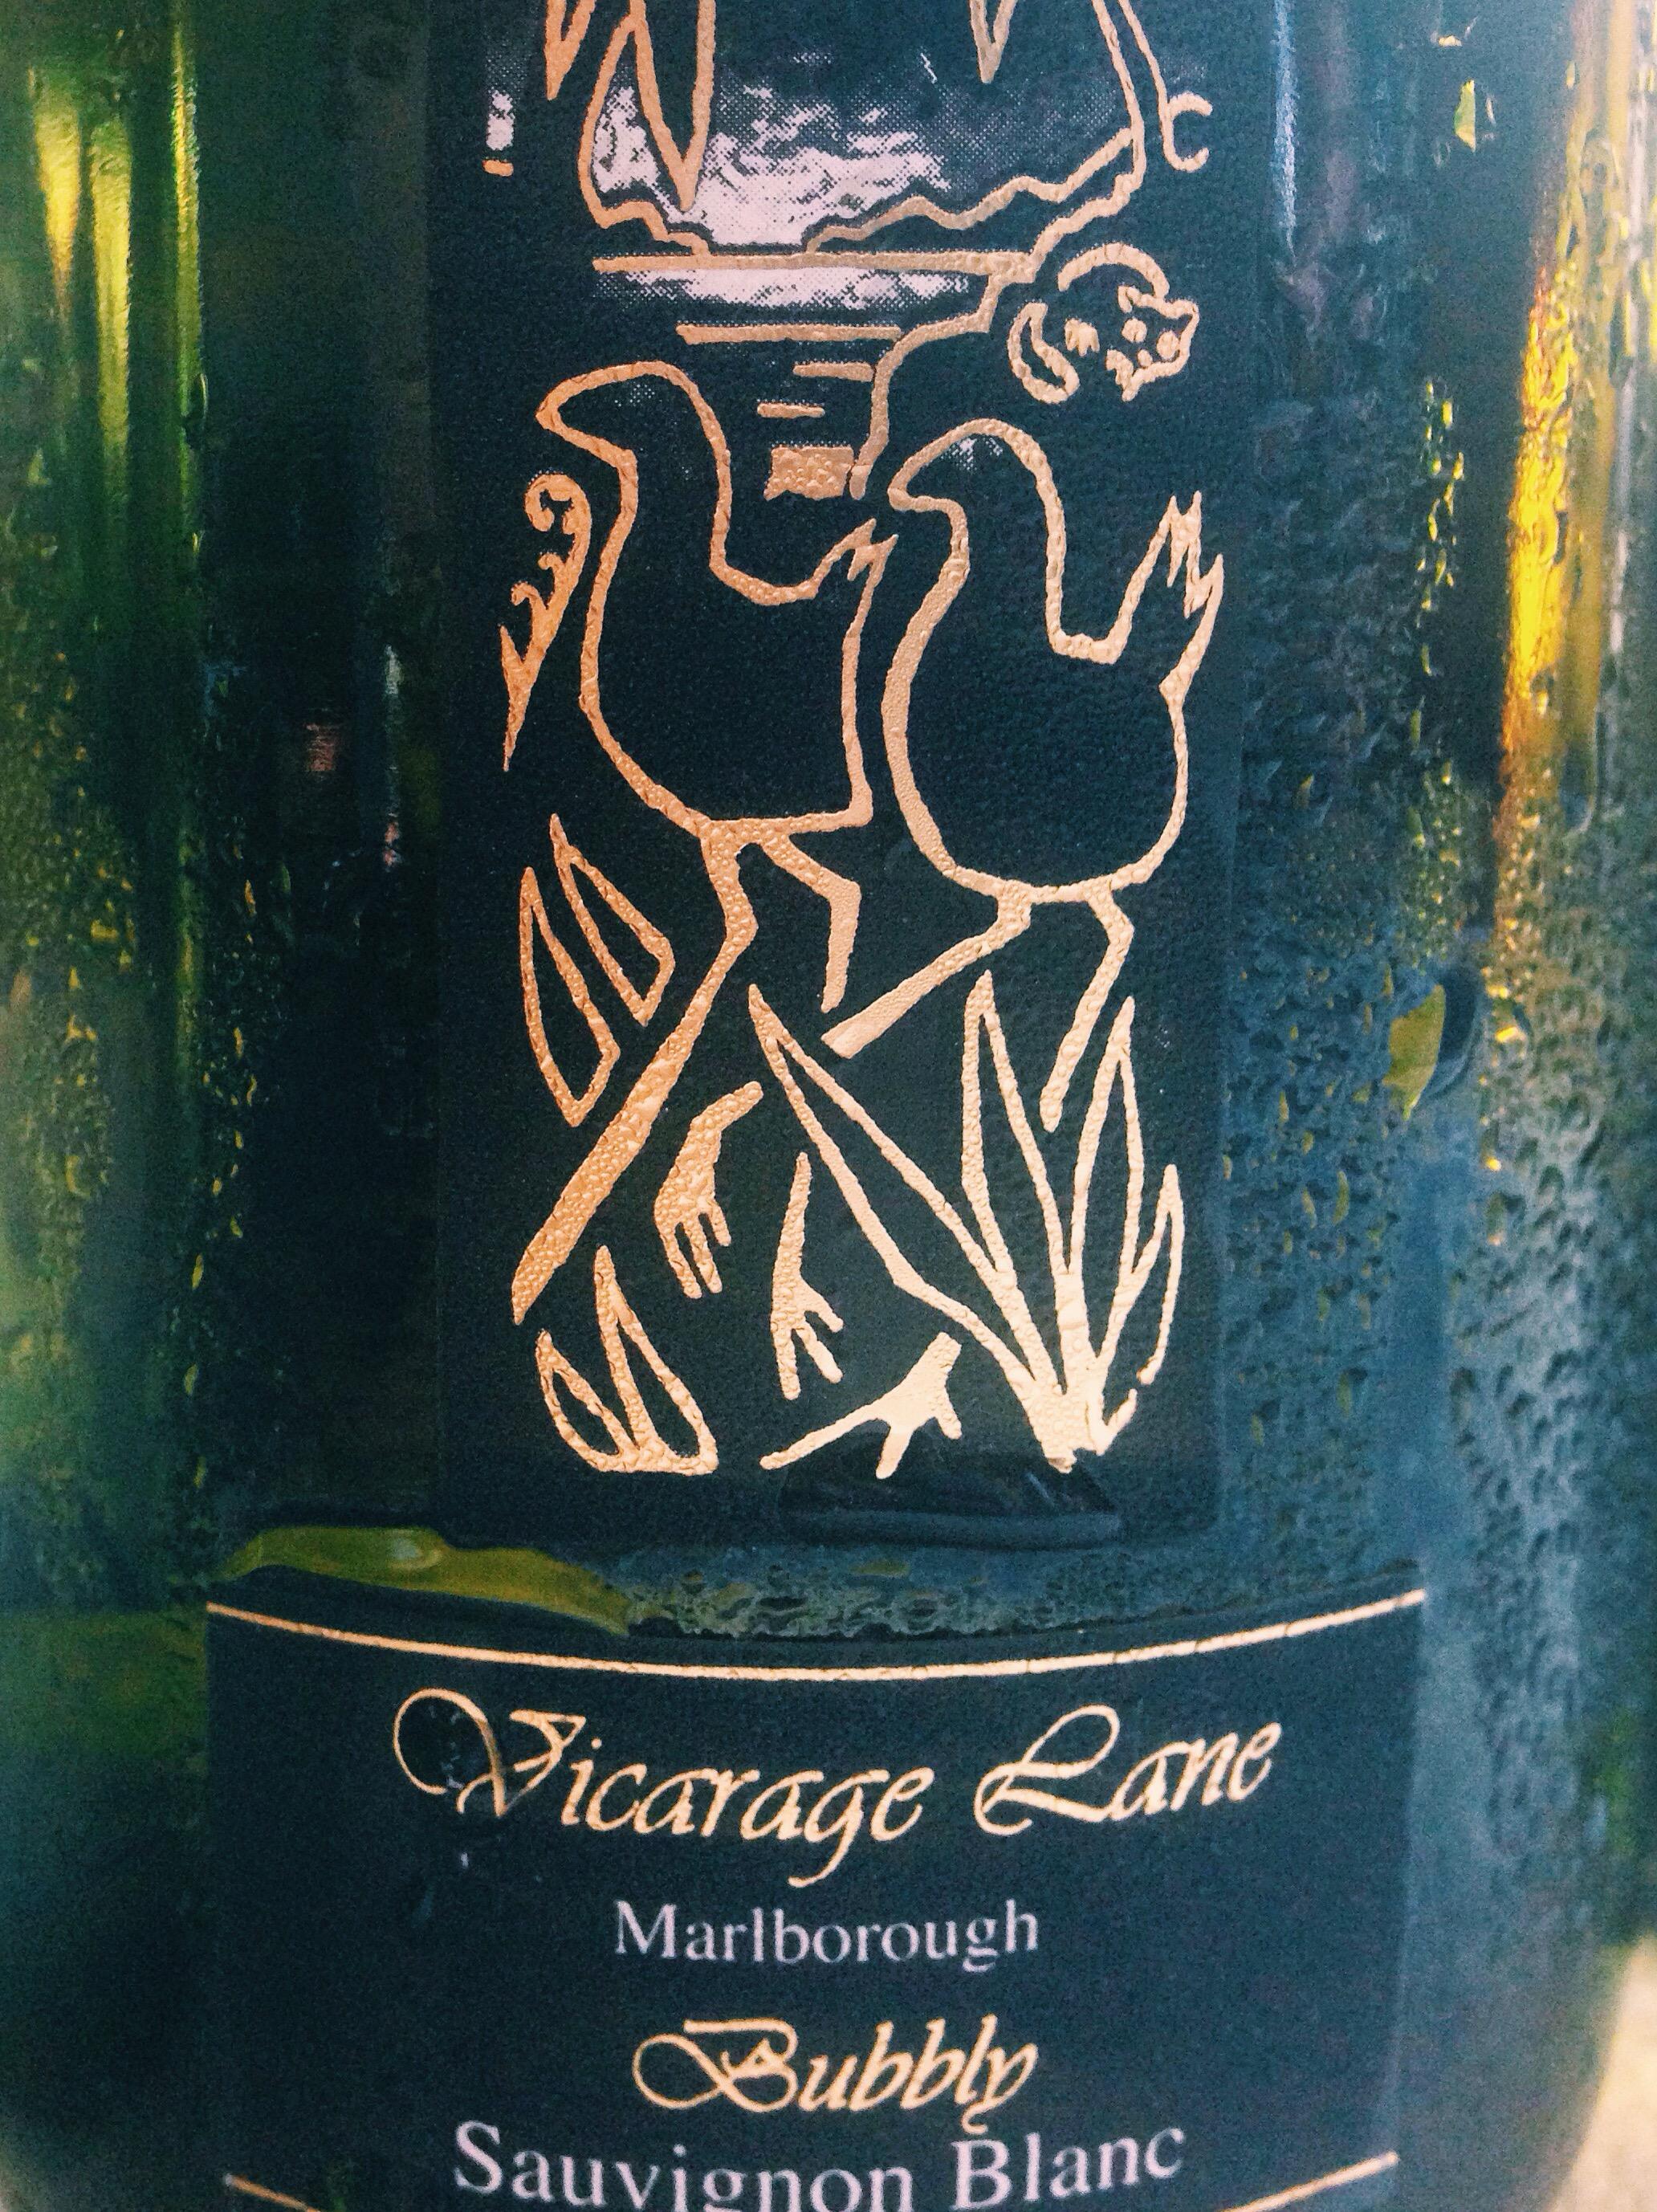 vicarage lane sauvignon blanc